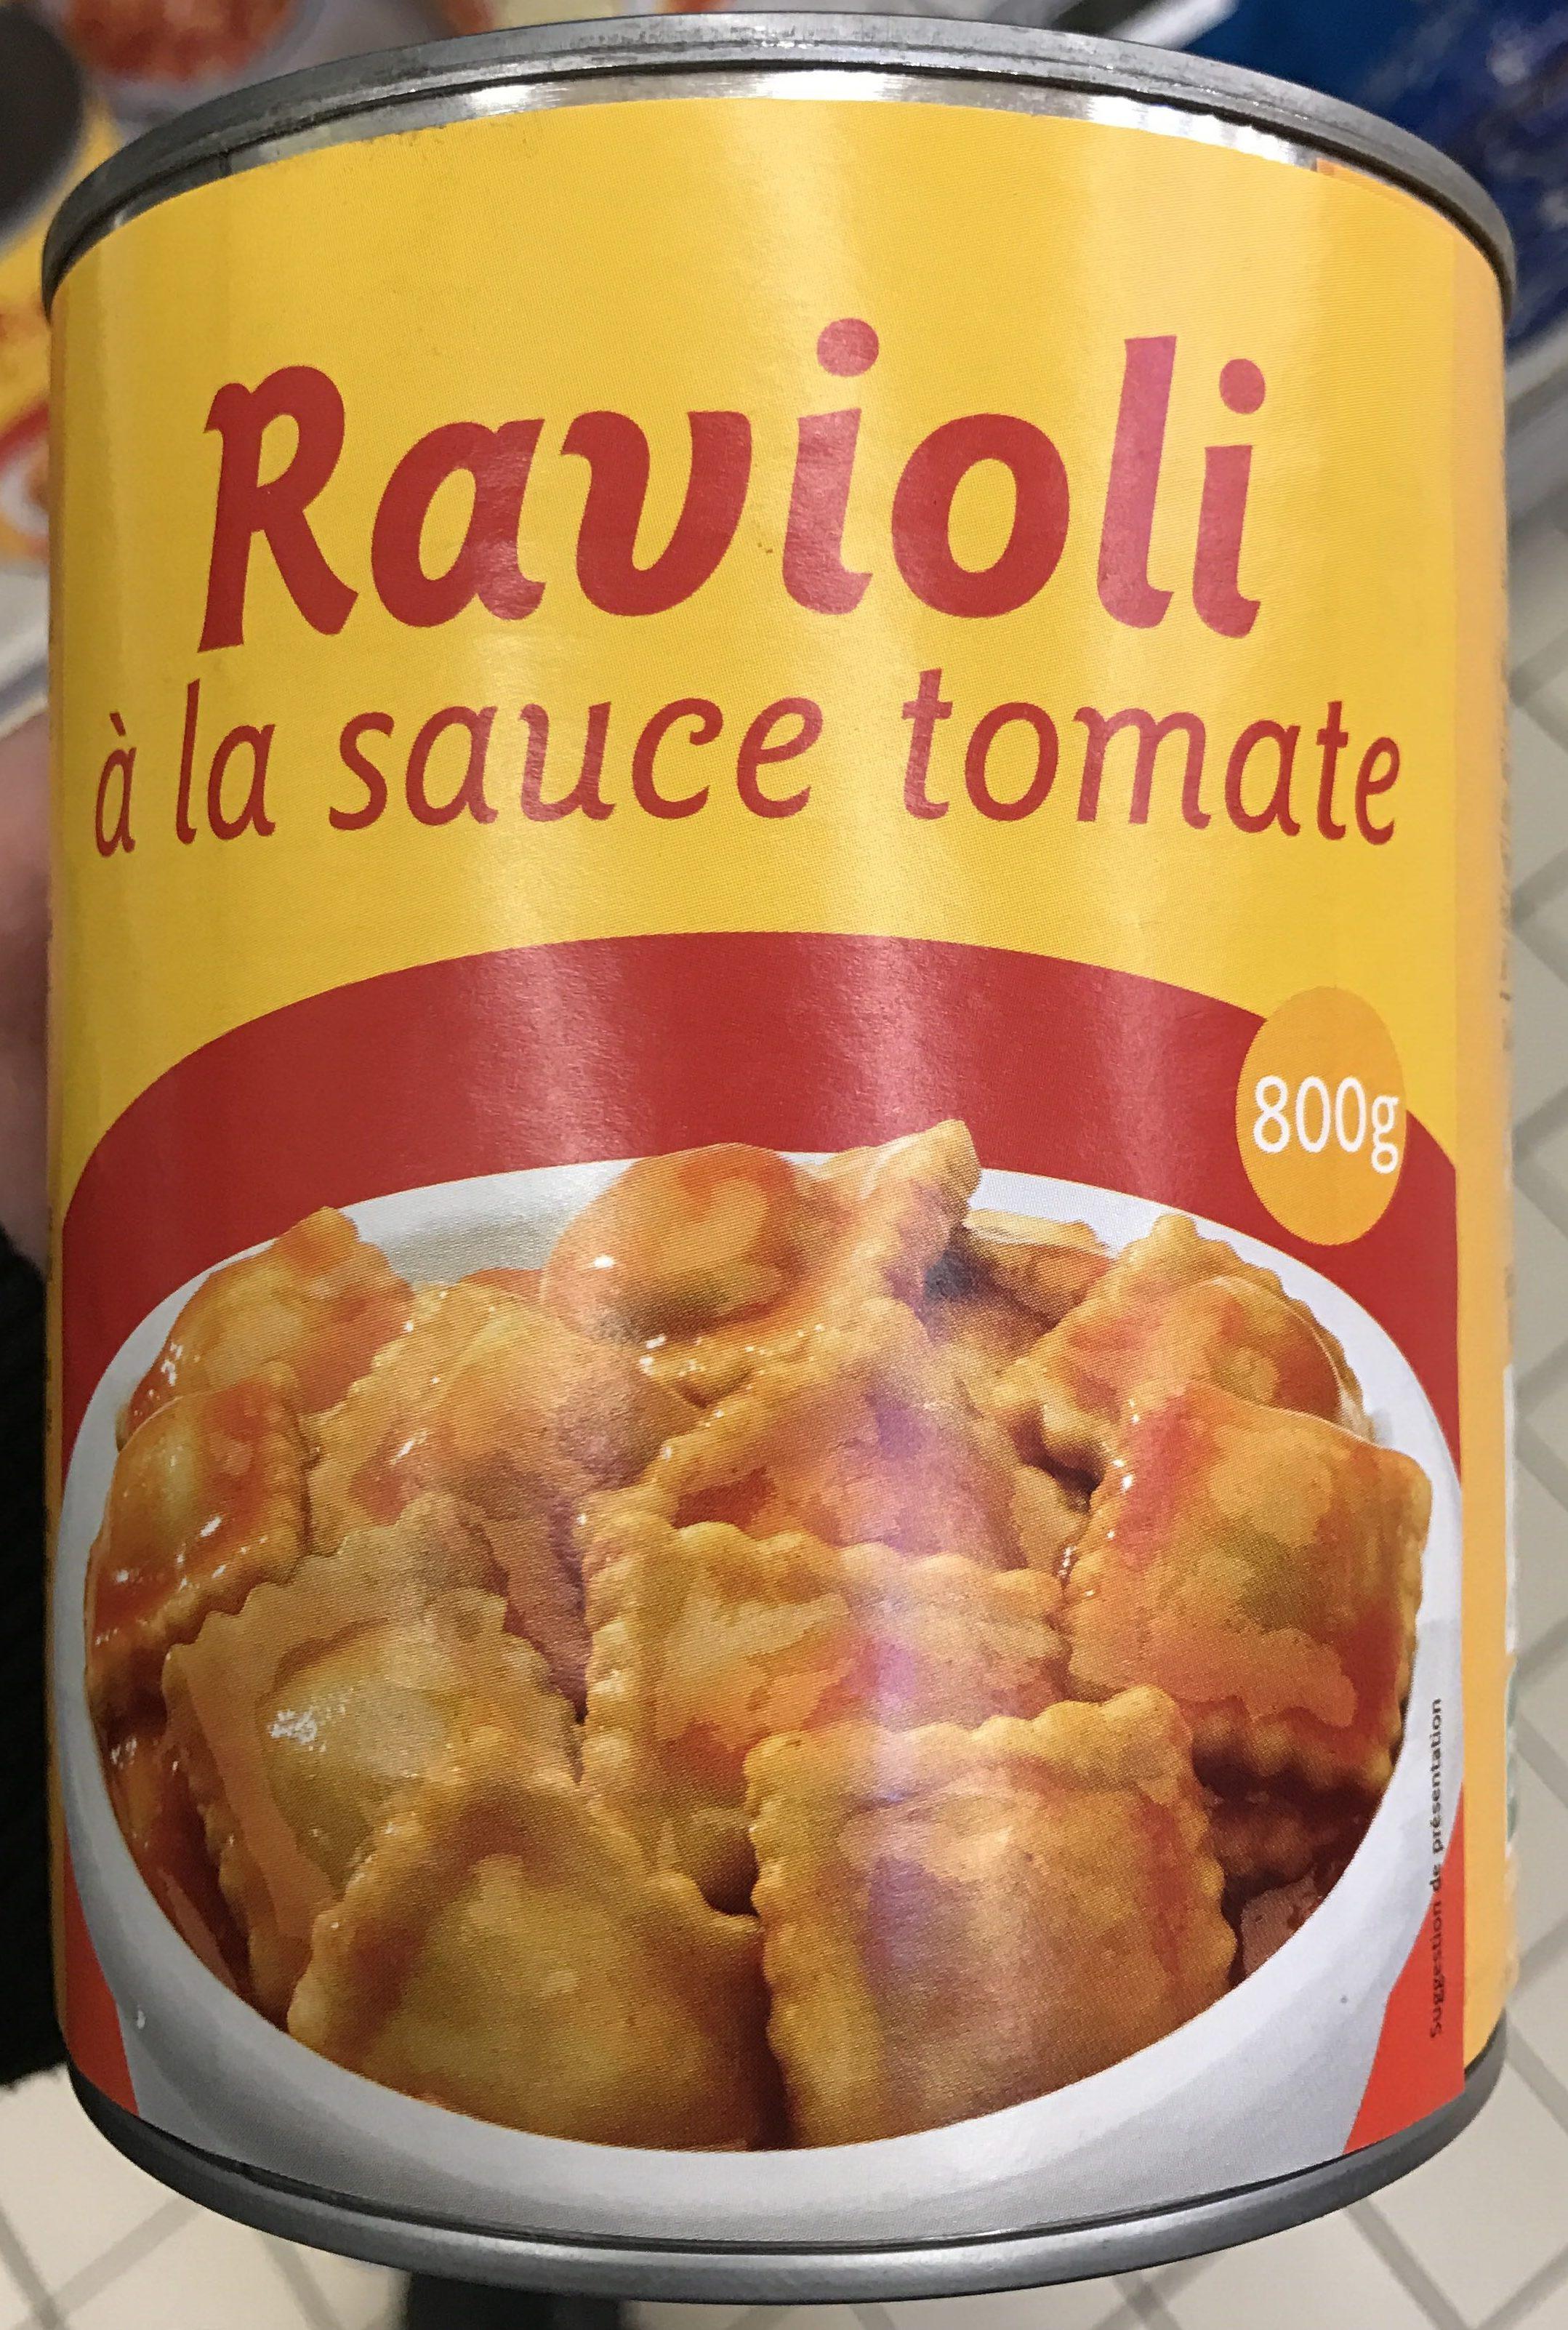 Ravioli à la sauce tomate - Produit